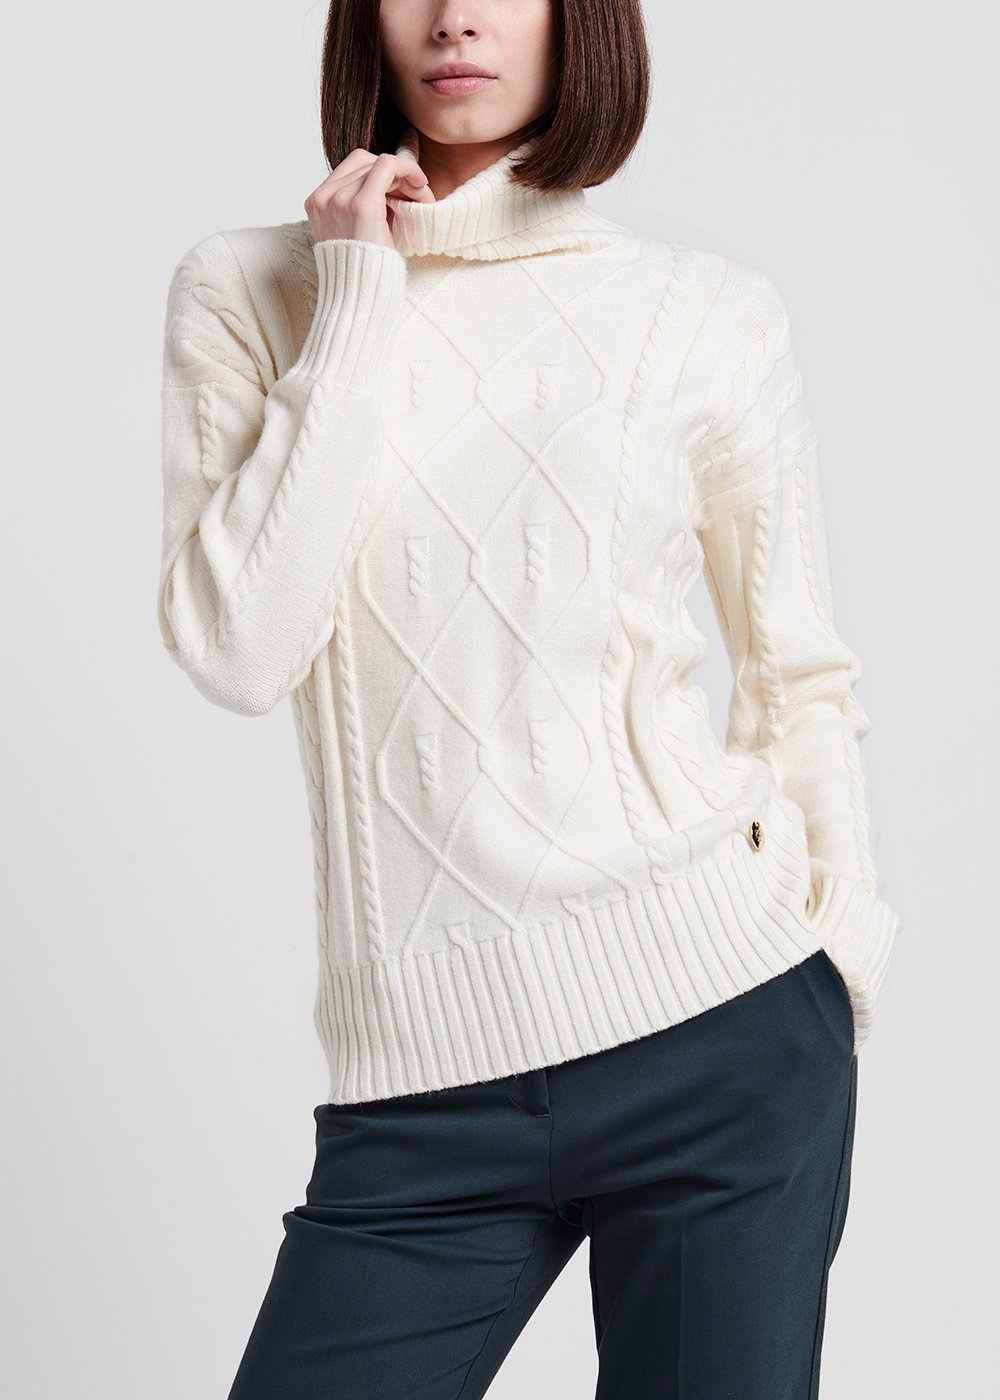 Turtleneck sweater in raw viscose - Grey - Woman